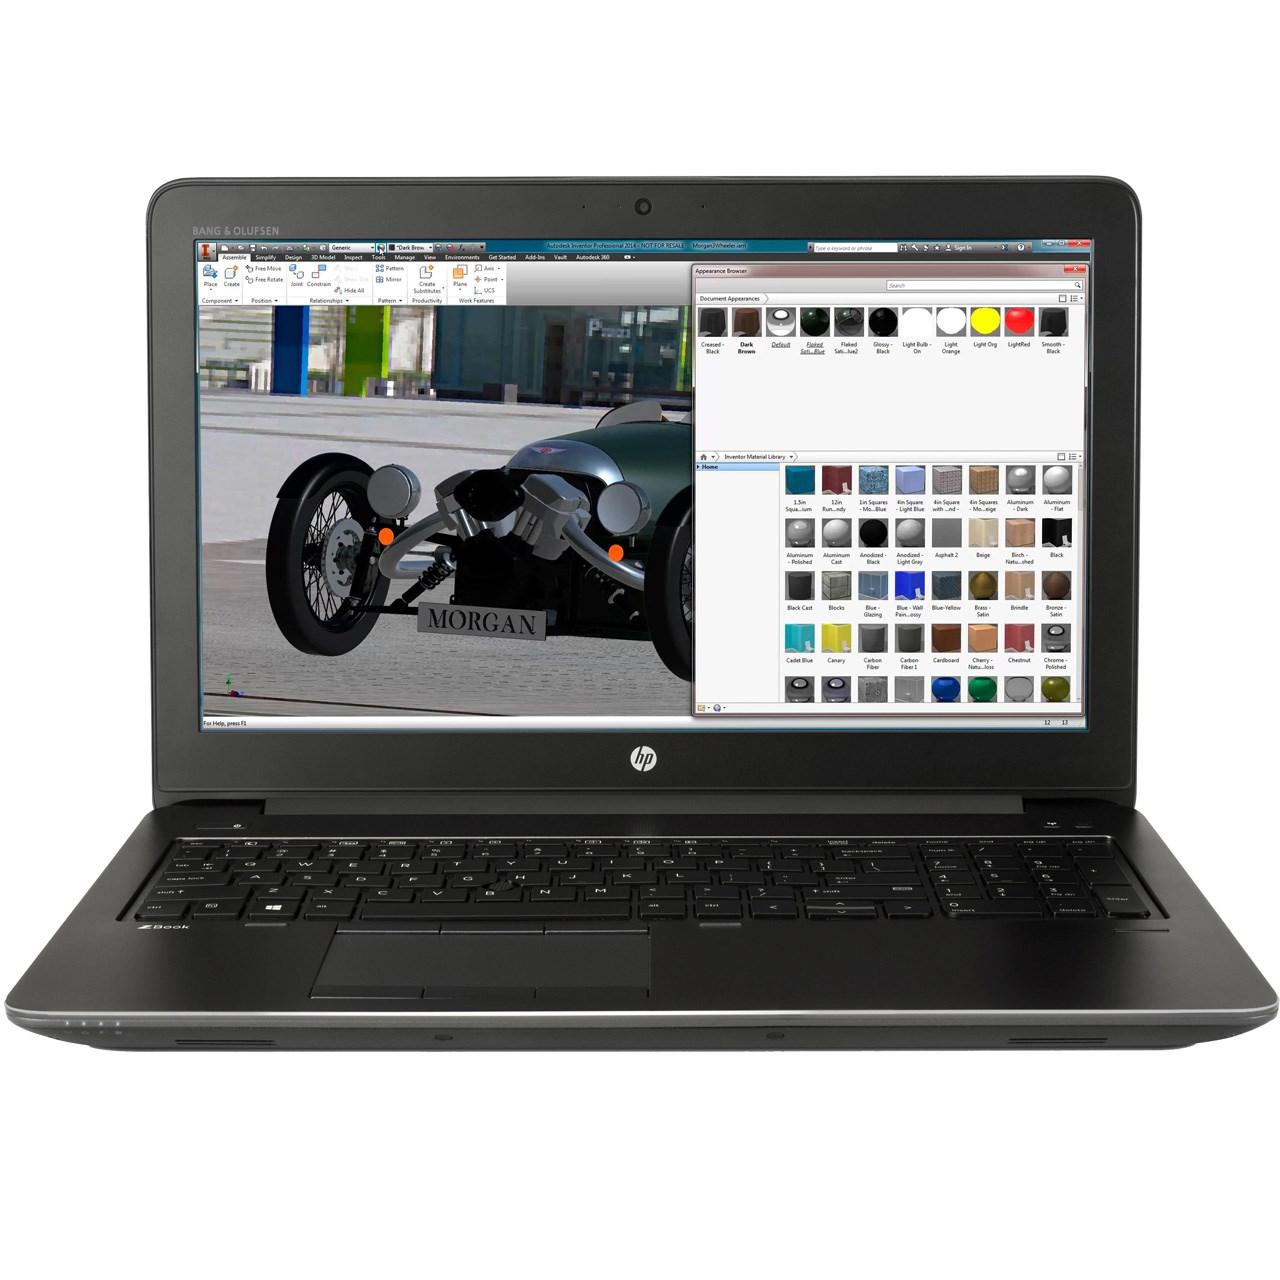 لپ تاپ 15 اینچی اچ پی مدل ZBook 15 G3 Mobile Workstation - C